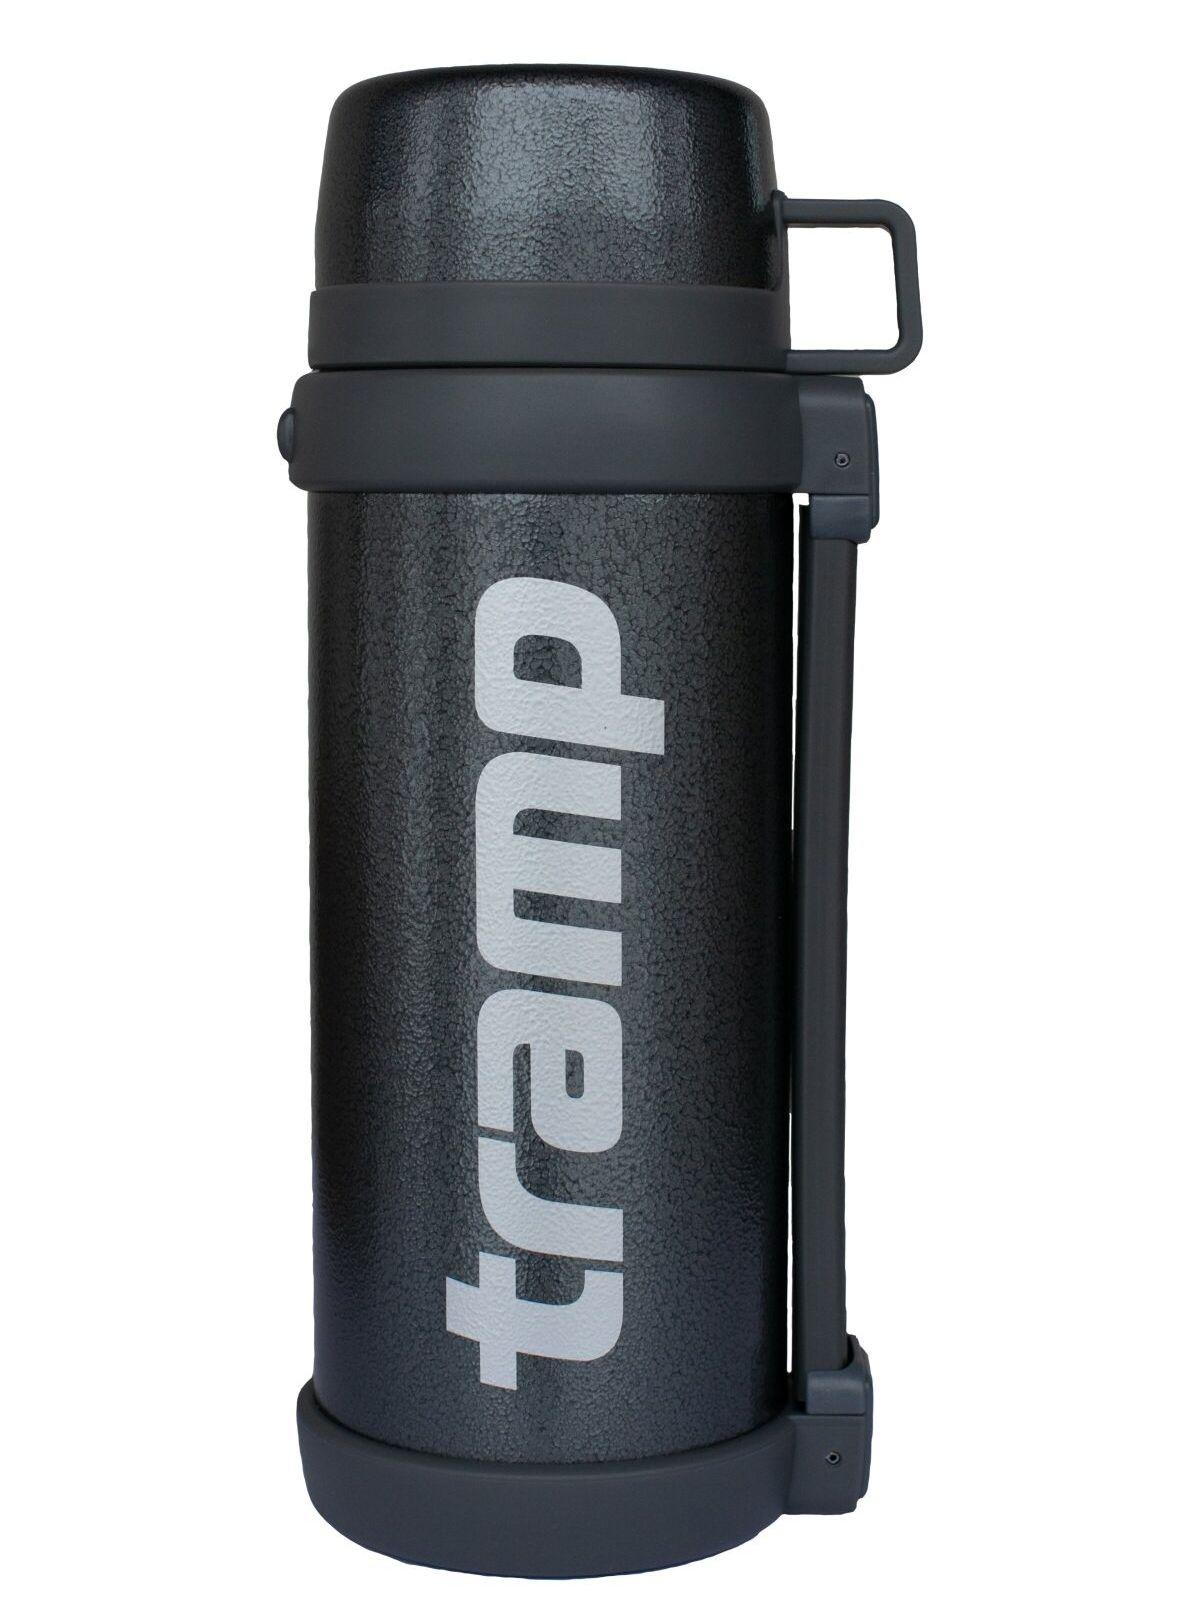 Термос Tramp TRC-096 Greenline 1.5 л  Гарантия 5 лет! Цвет серый!